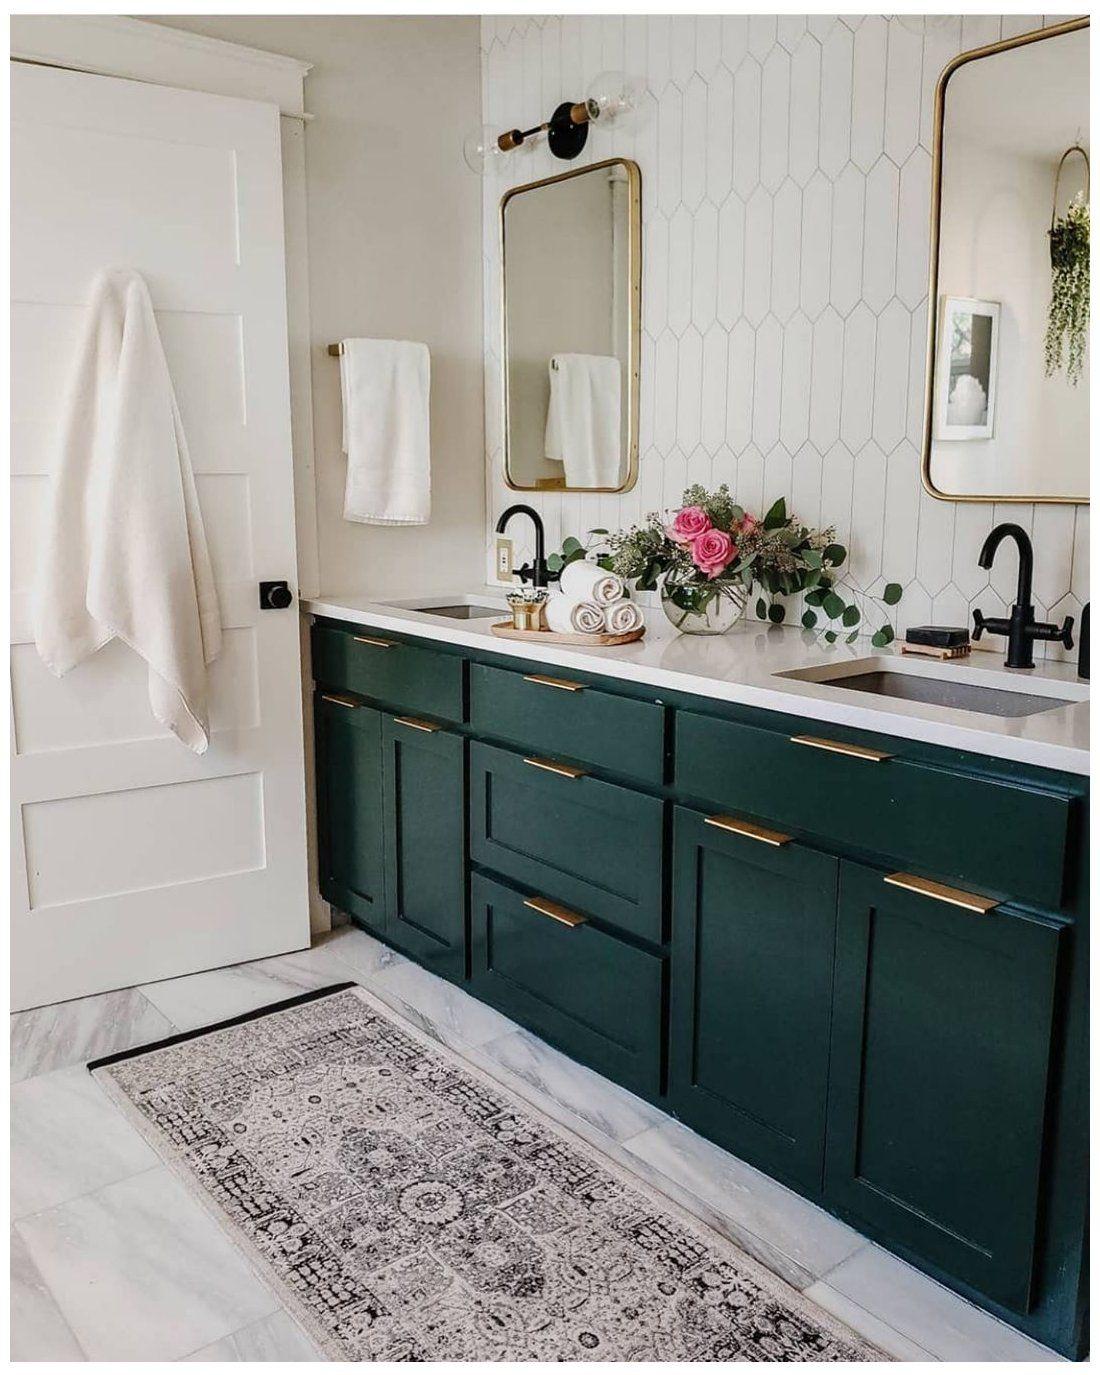 Bathrooms Of Instagram On Instagram Loving This Emerald Green Vanity From Craven Haven Emerald Green Bathroom Green Vanity Bathroom Design Decor